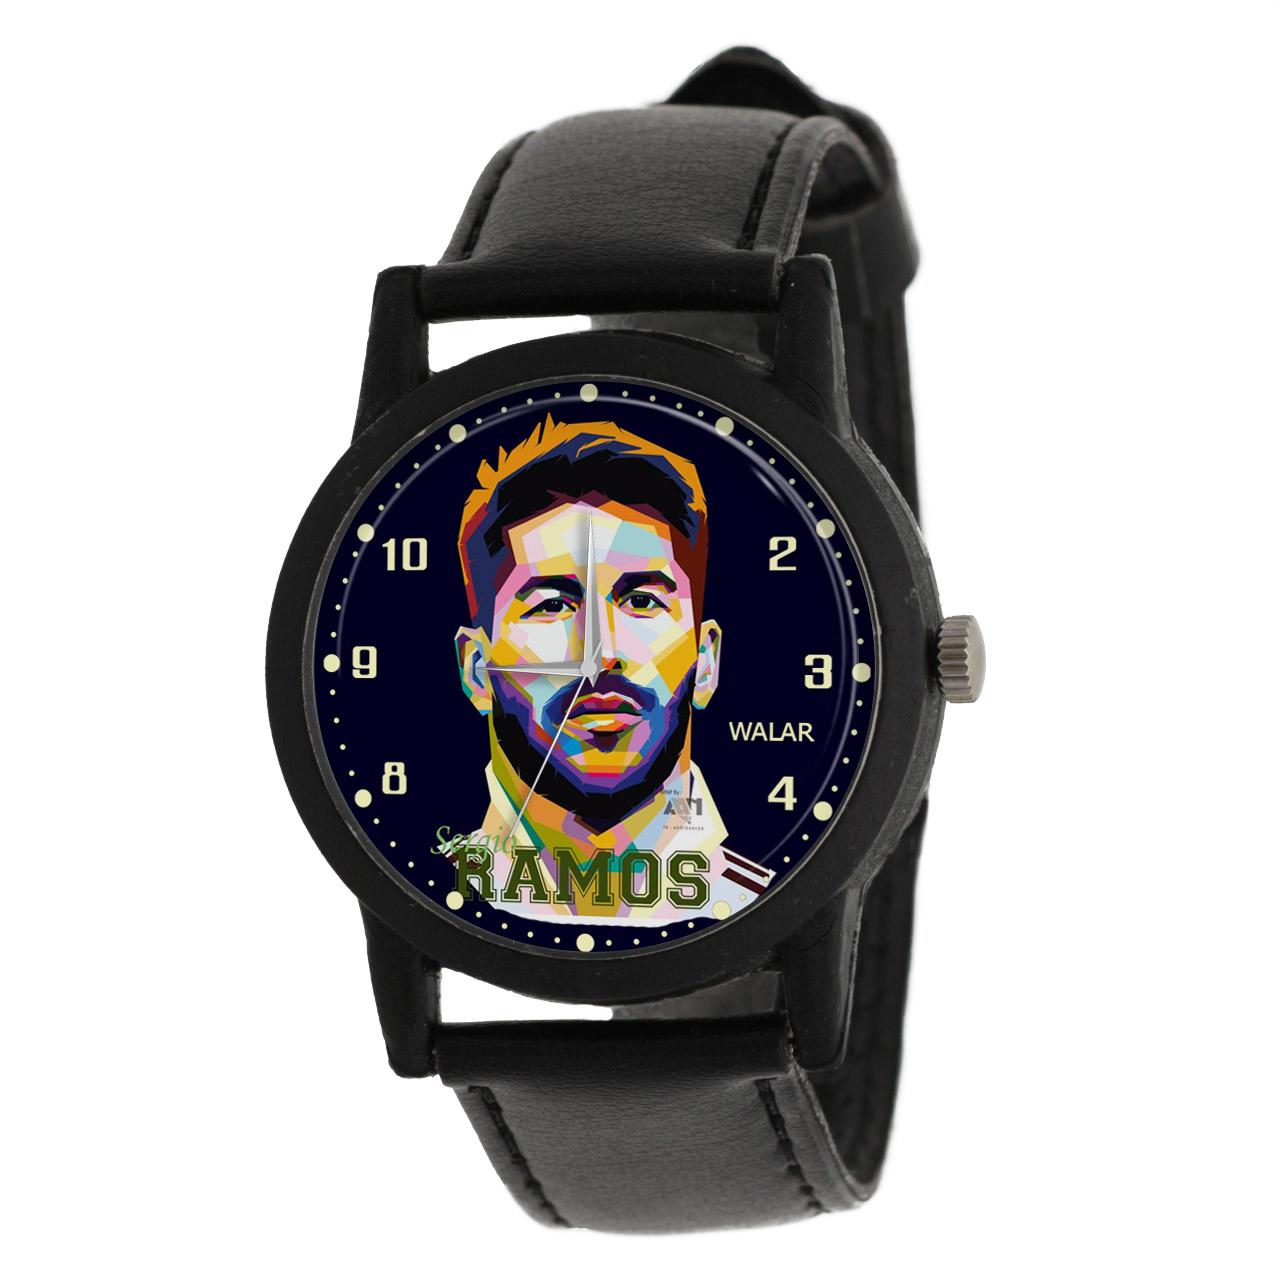 ساعت مچی عقربه ای مردانه والار طرح سرخیو راموس کد LF2151